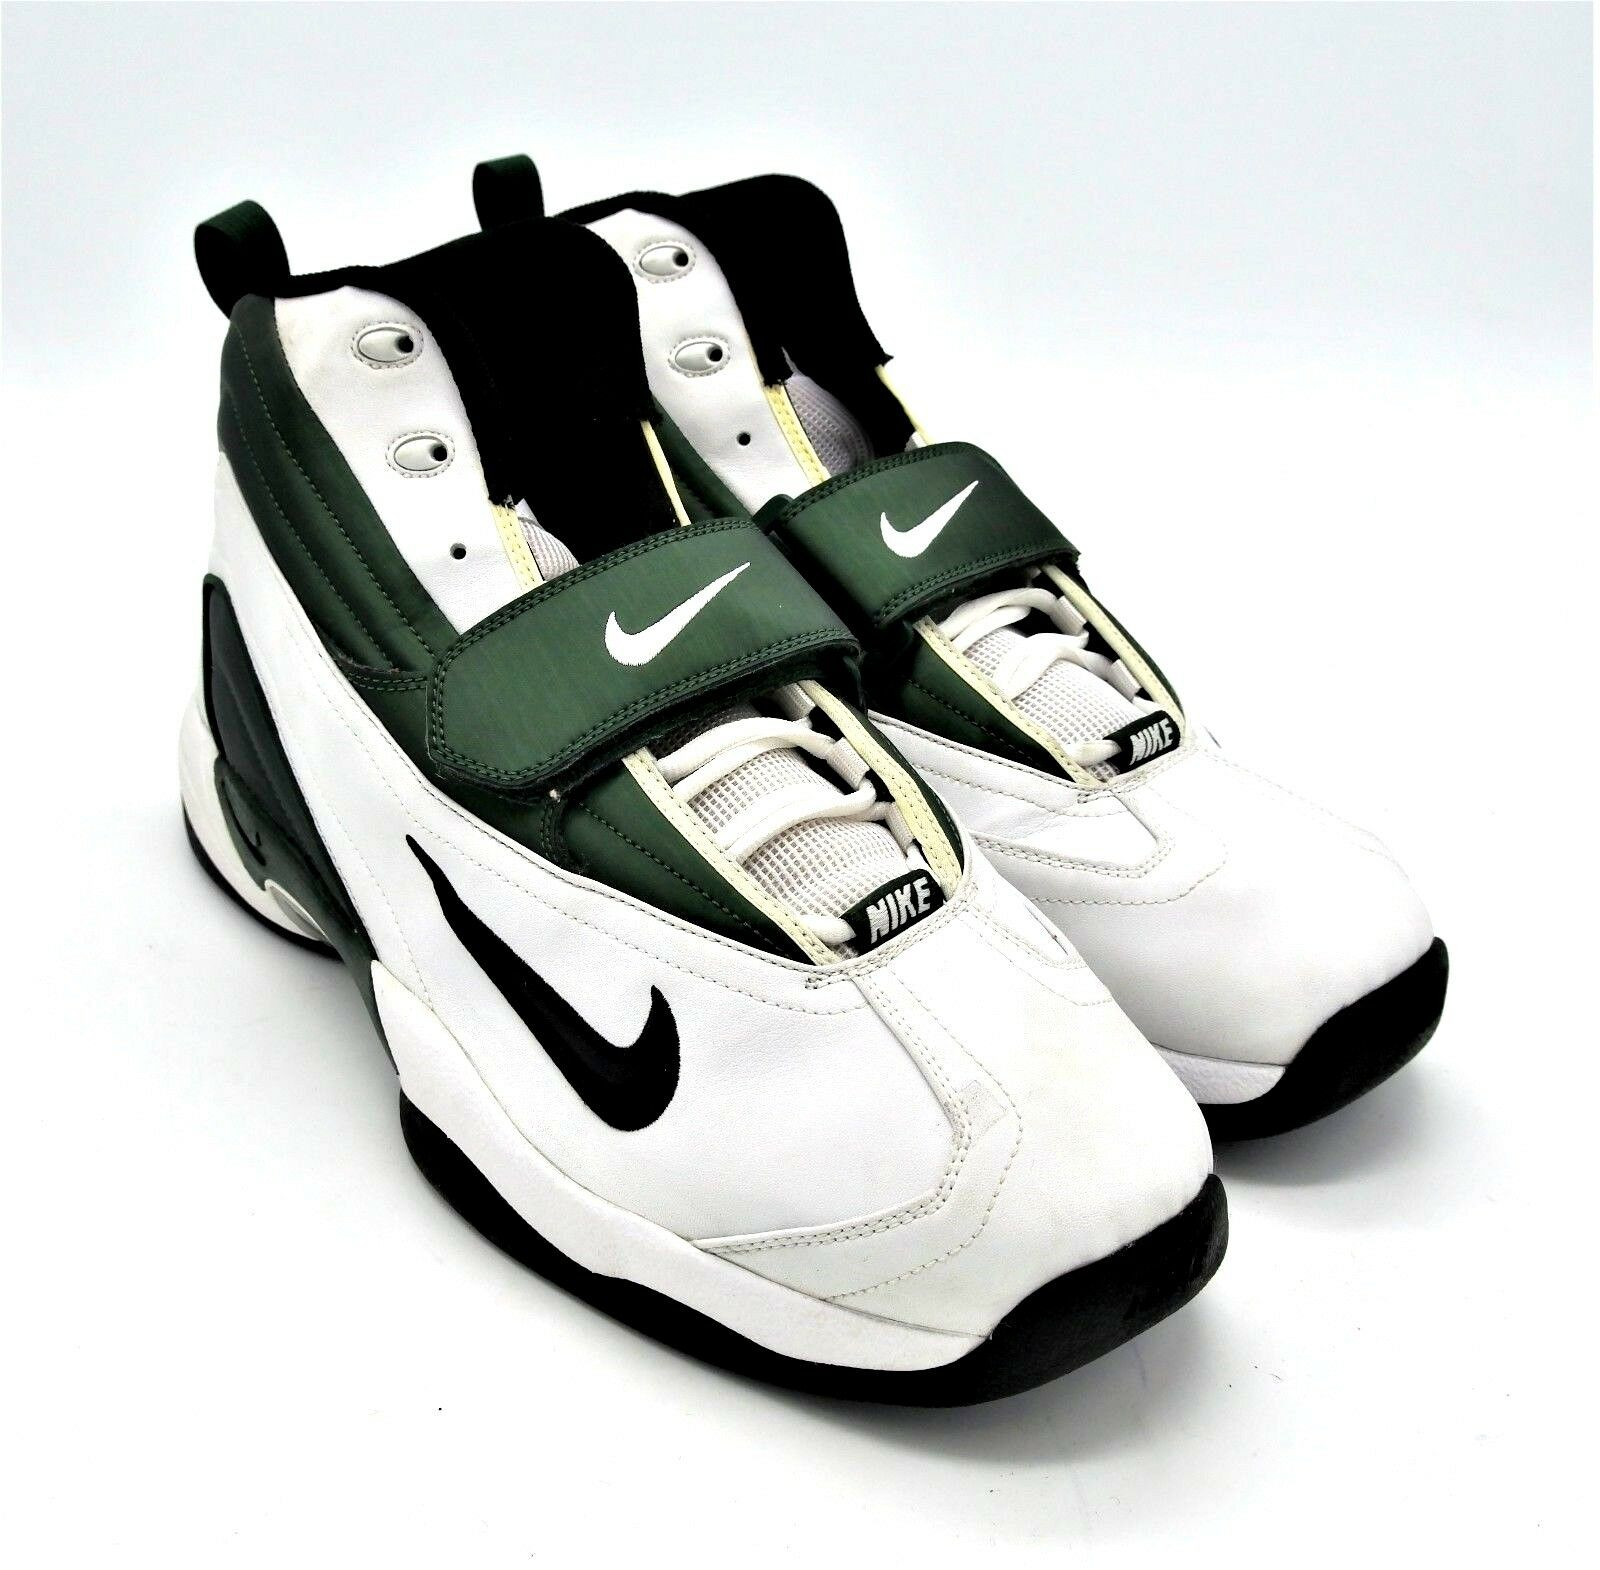 D879 New Men's Nike Air Pro BBX Stove White Black Forest Green 17 M